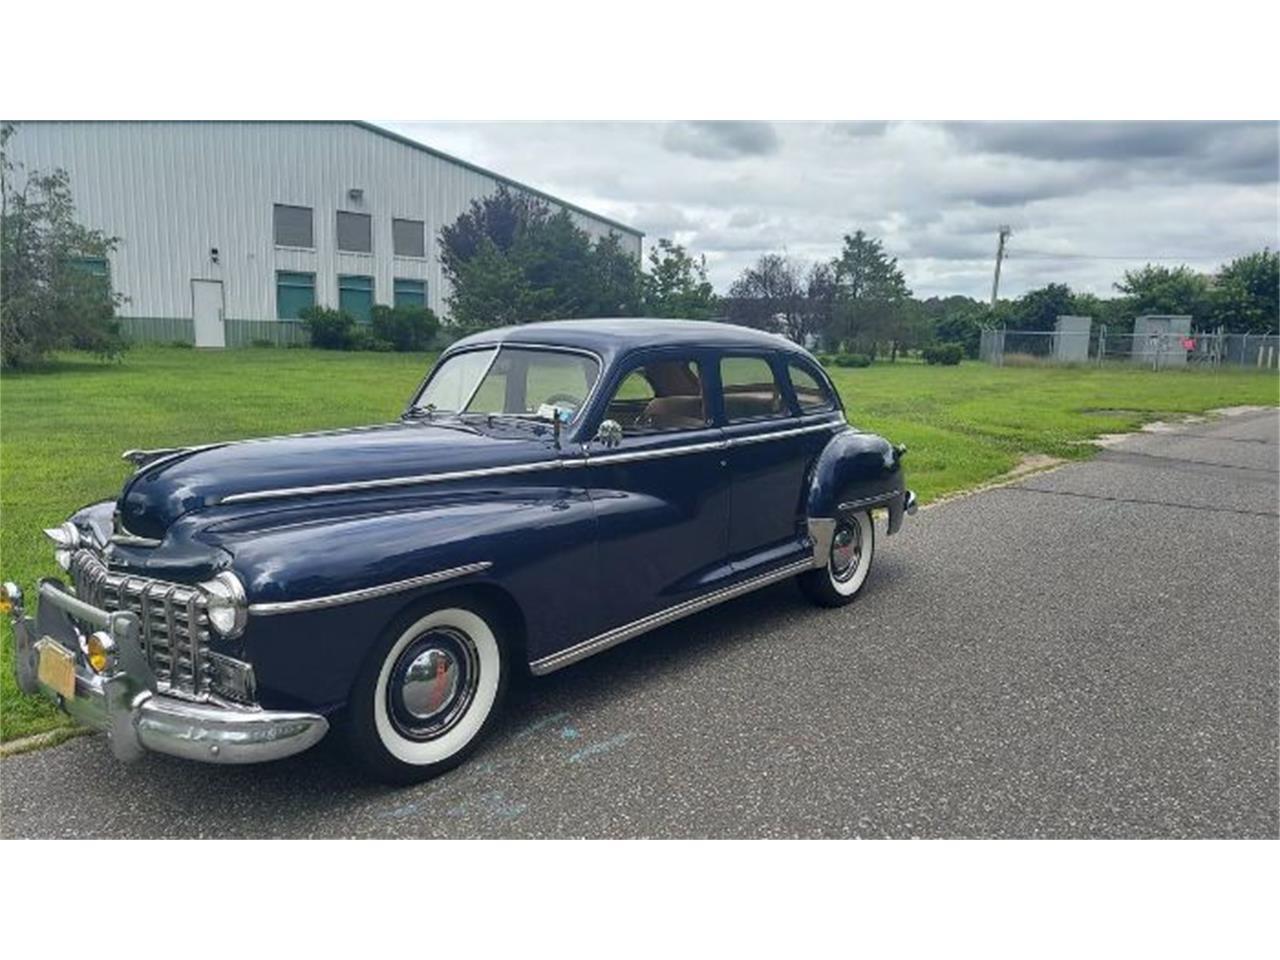 for sale 1948 dodge sedan in cadillac, michigan cars - cadillac, mi at geebo